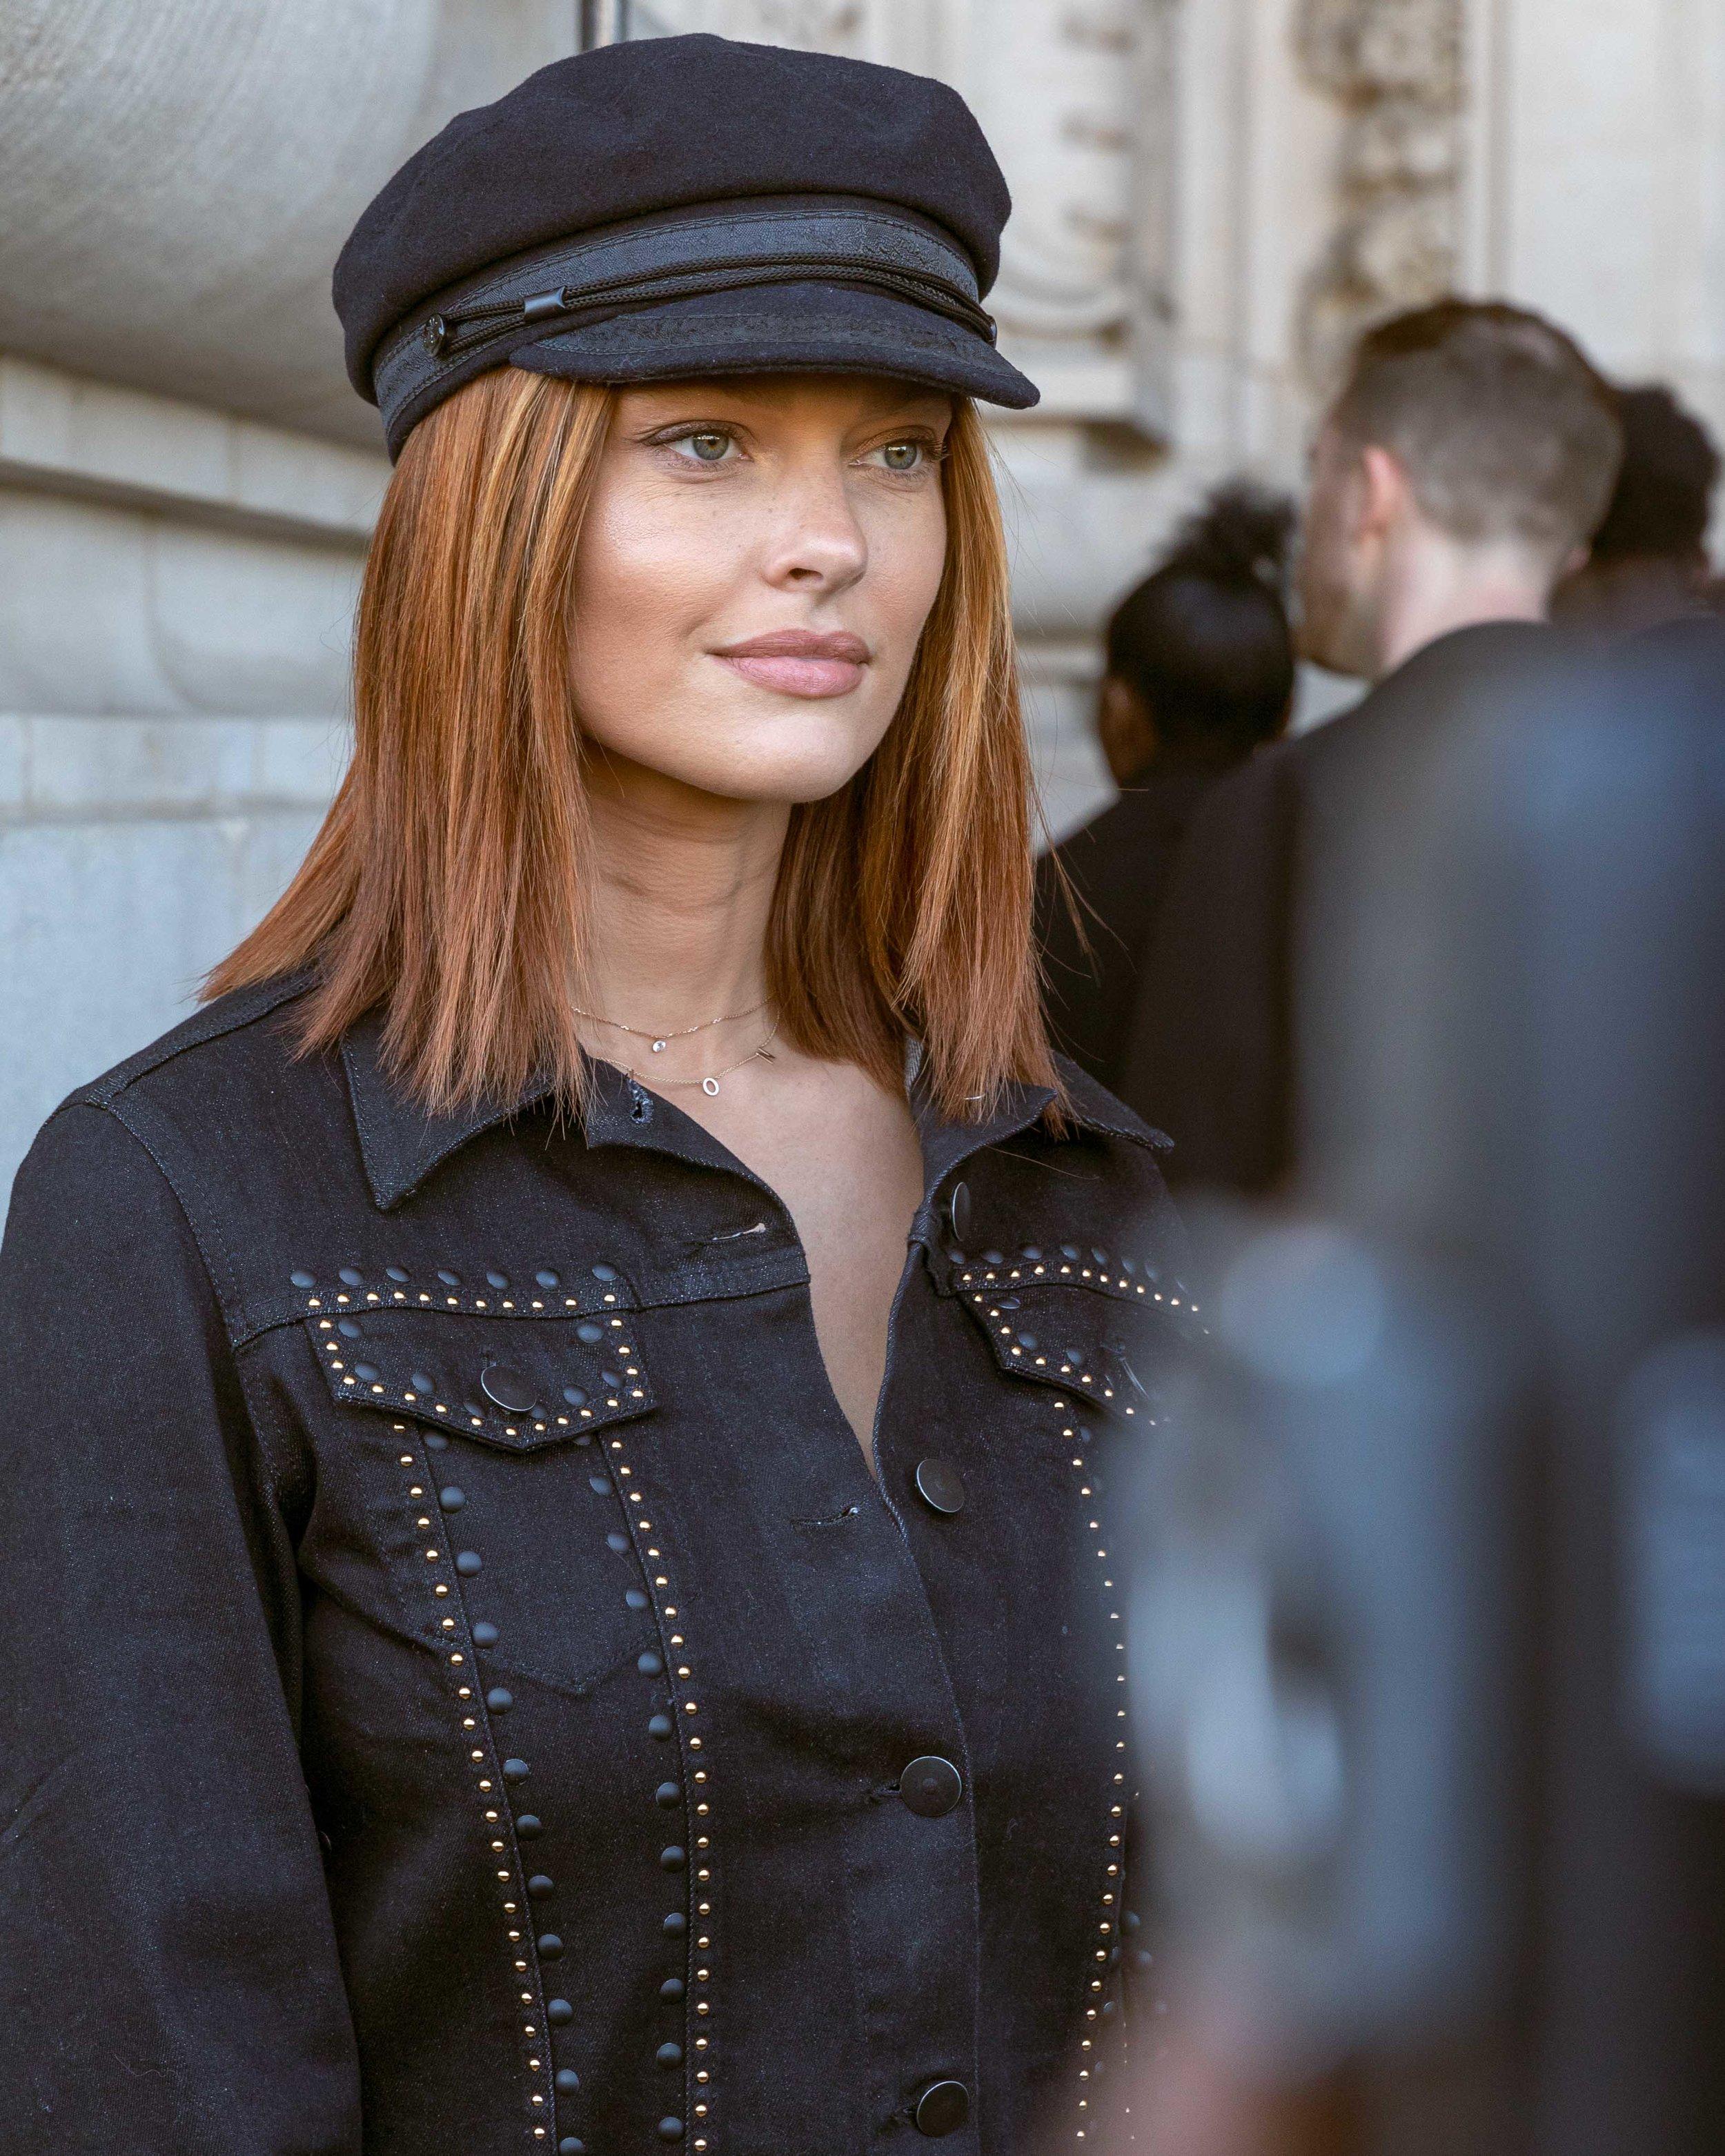 Paris-Fashion-Week-Spring-2019-September-2018_by_Alexis_Breugelmans_006.jpg